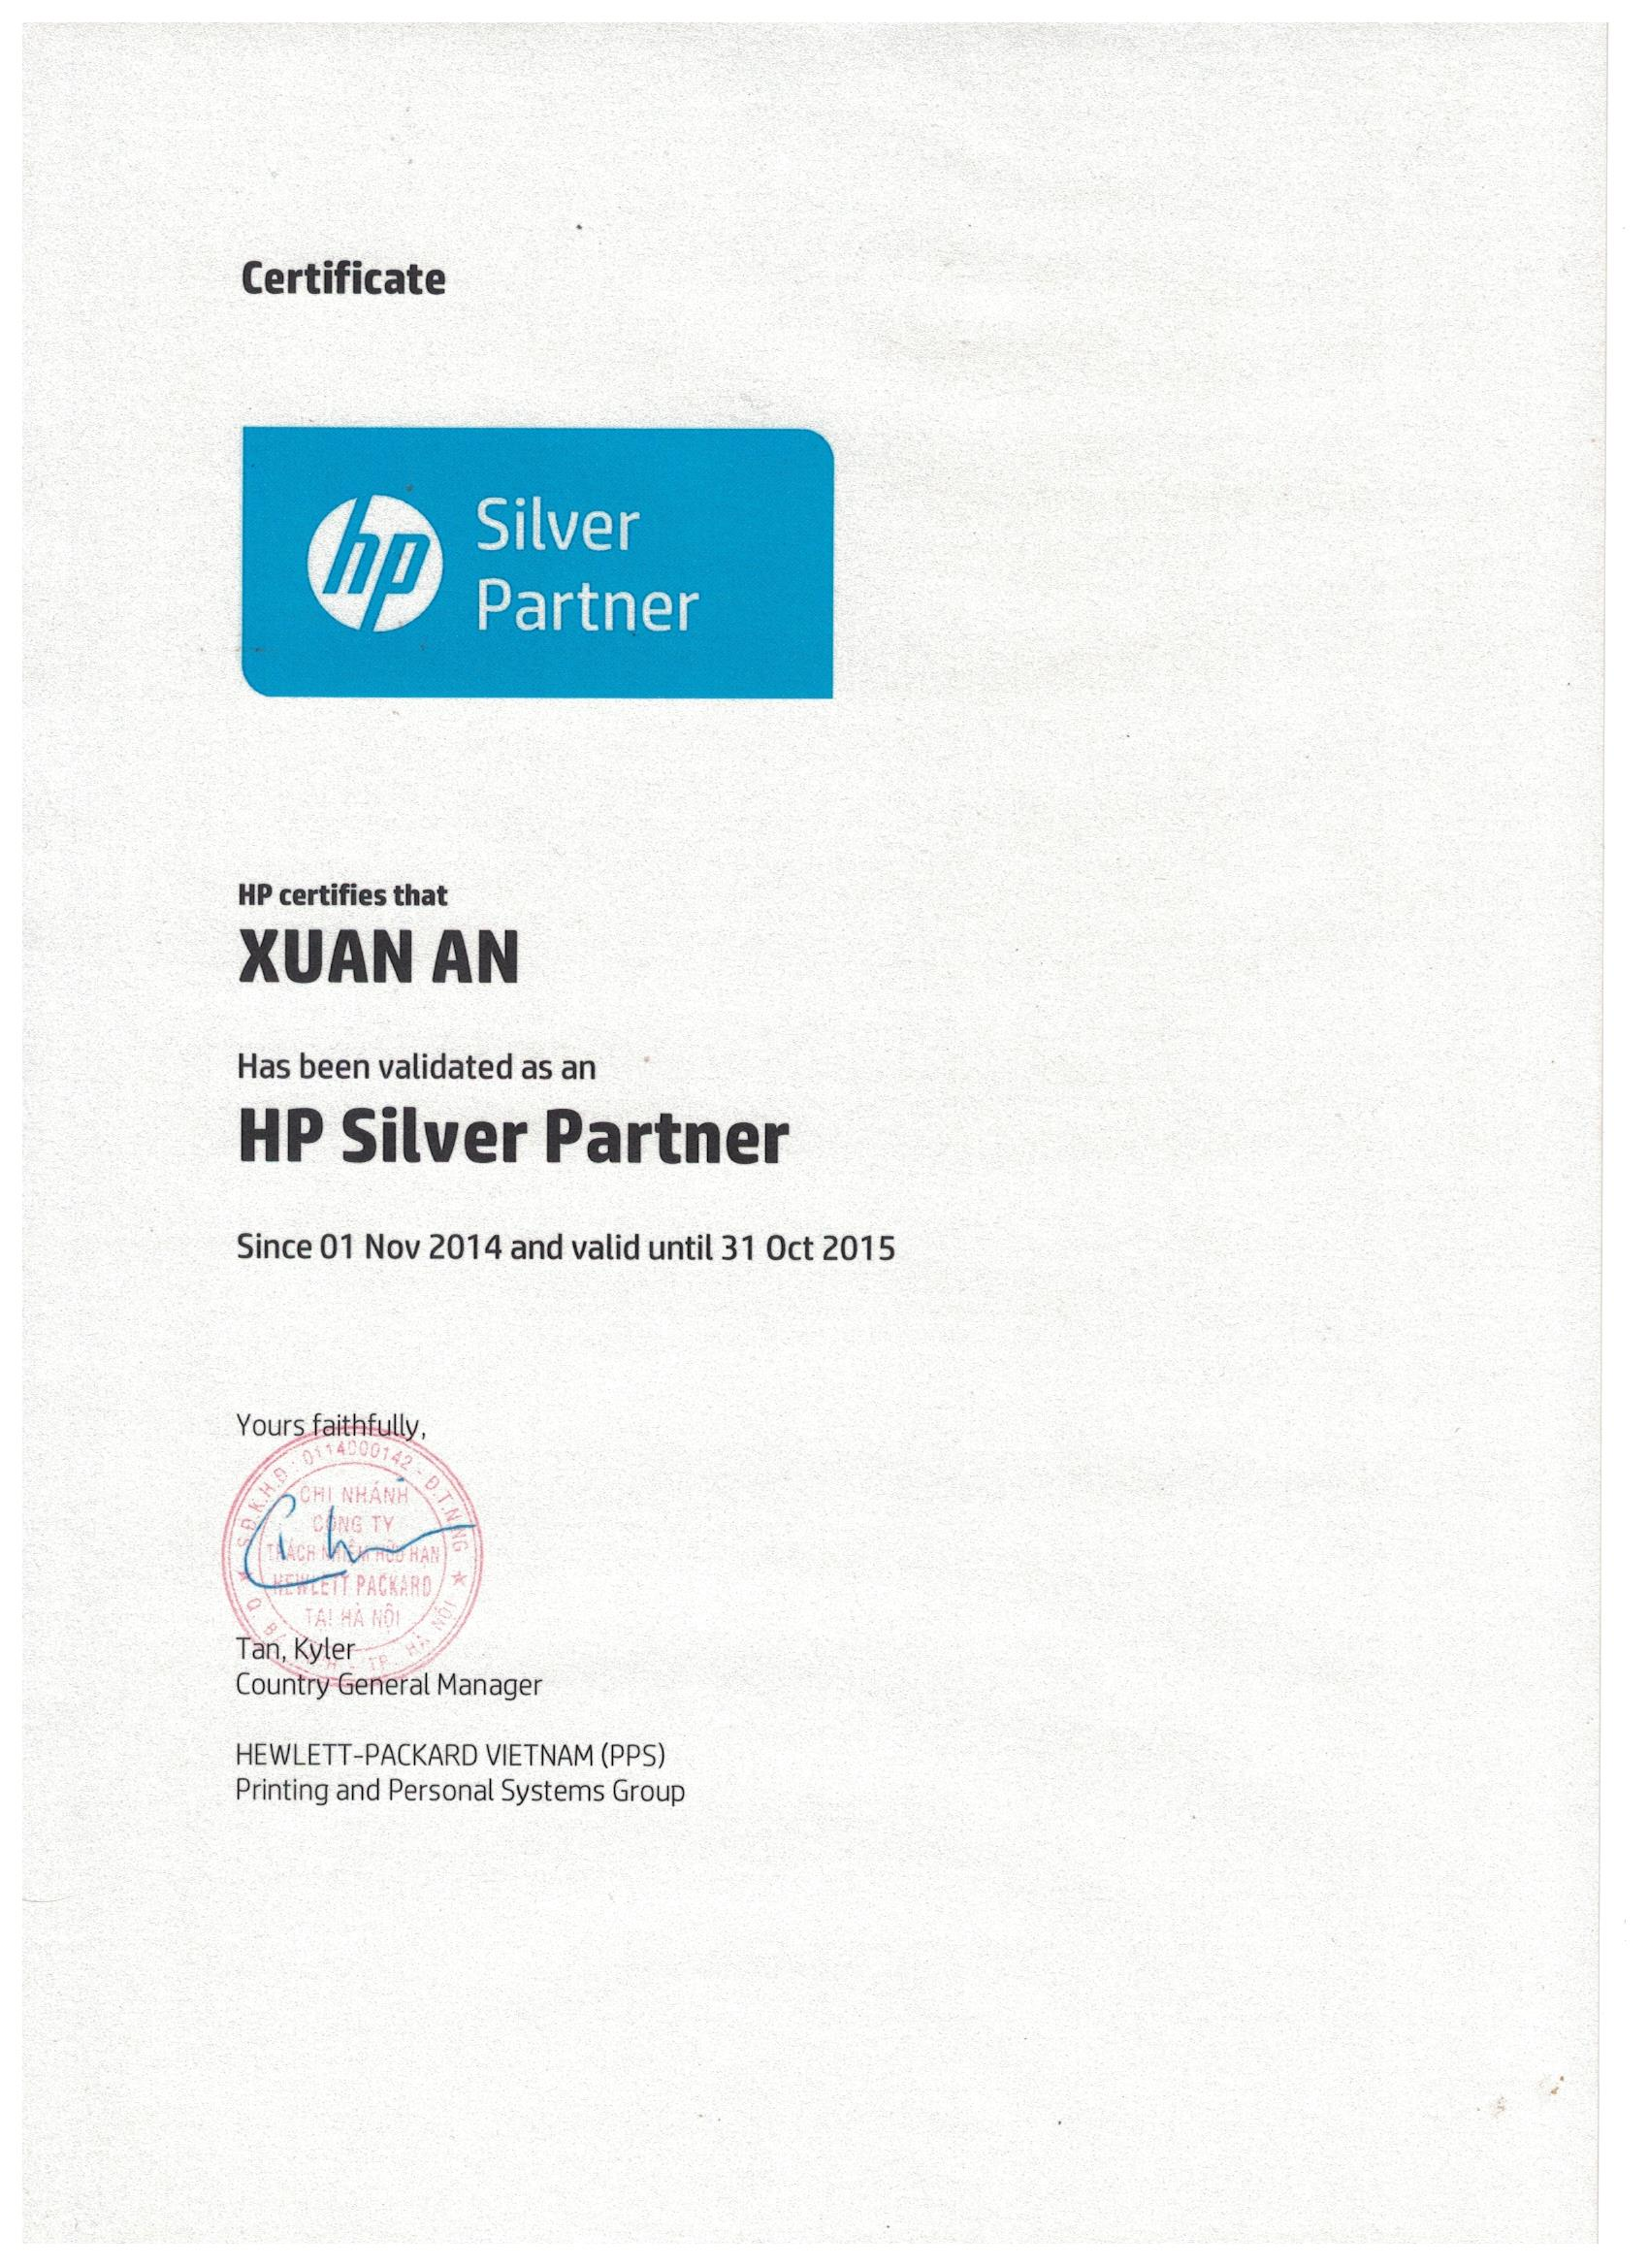 HP Probook 430 G7 - 9GQ07PA (Silver)